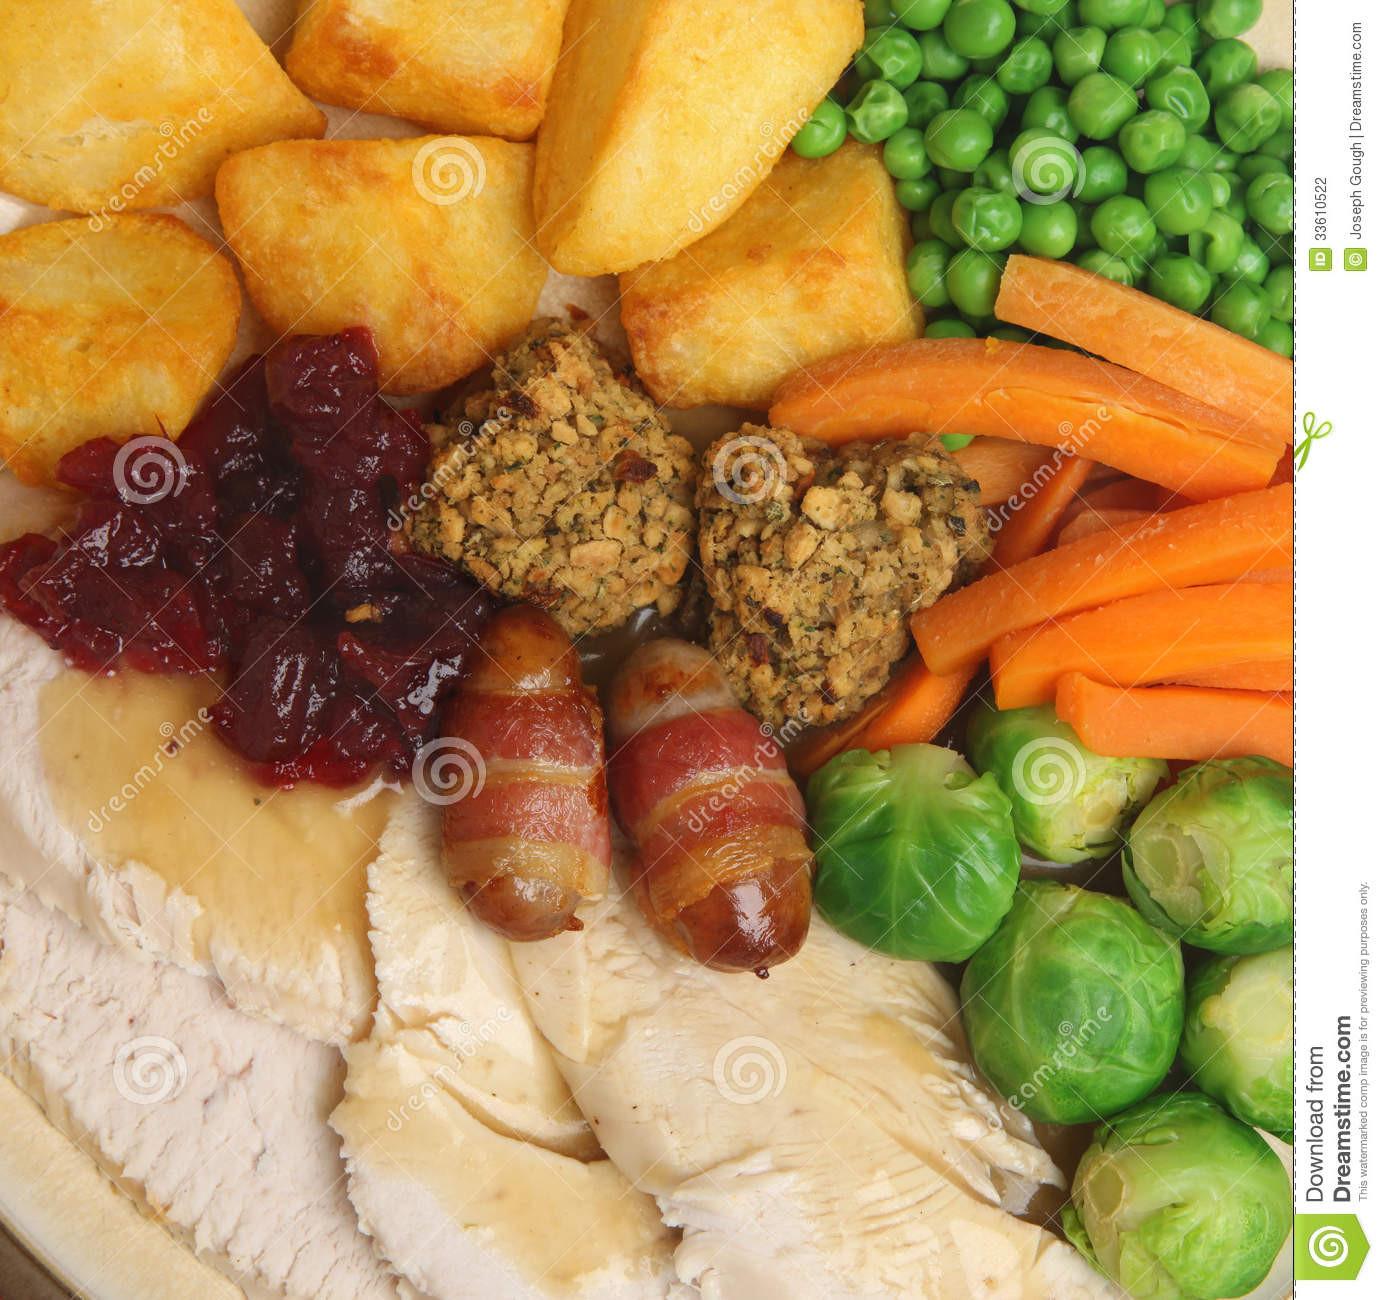 Publix Christmas Dinner  Christmas Roast Turkey Dinner Stock Image of